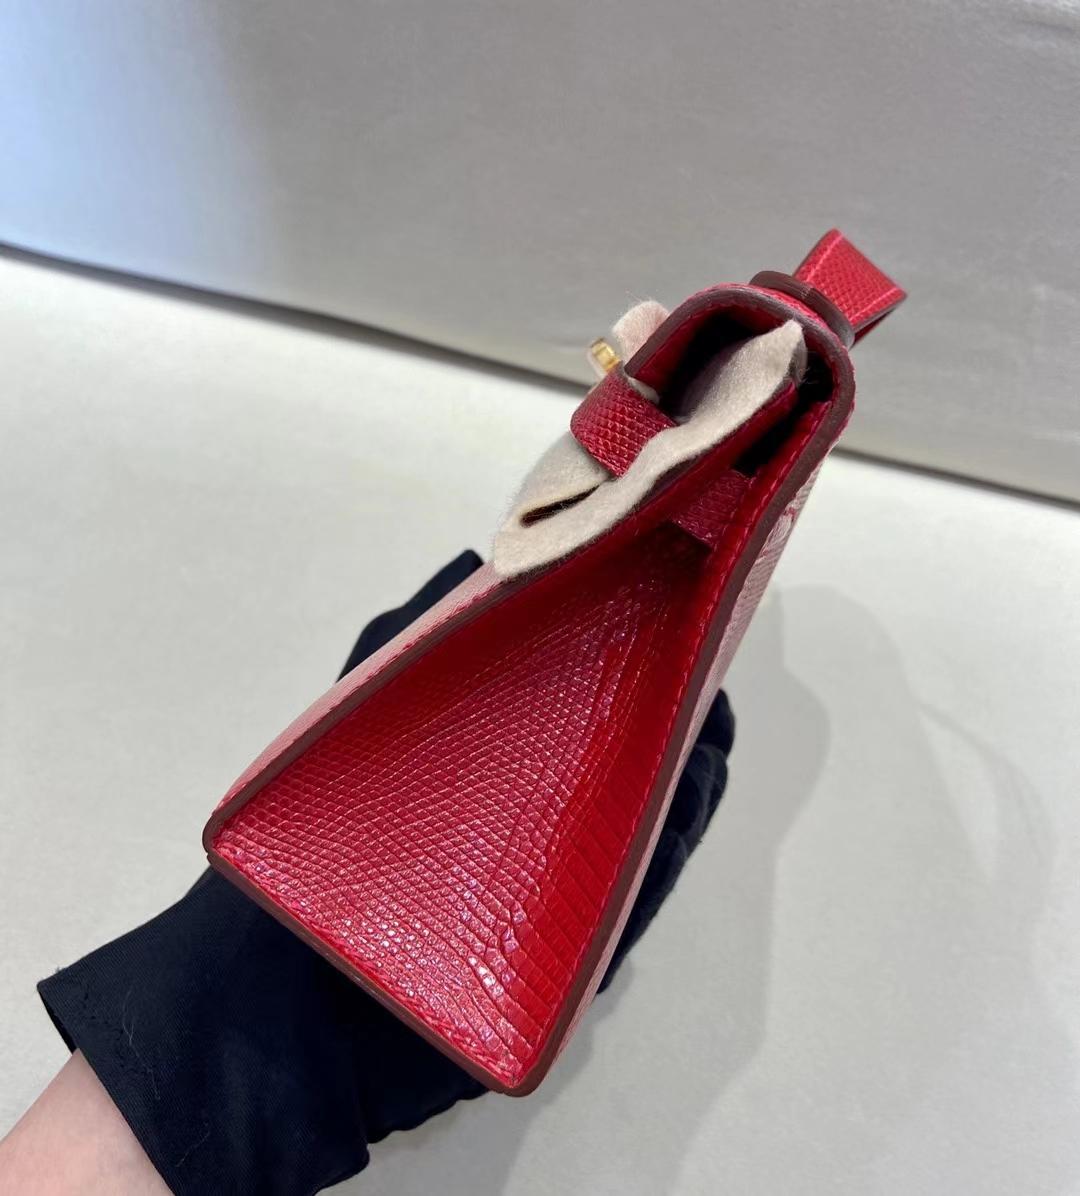 Hermès(爱马仕)miniKelly pochette 53正红 蜥蜴皮 金扣  22cm 顶级纯手工 现货